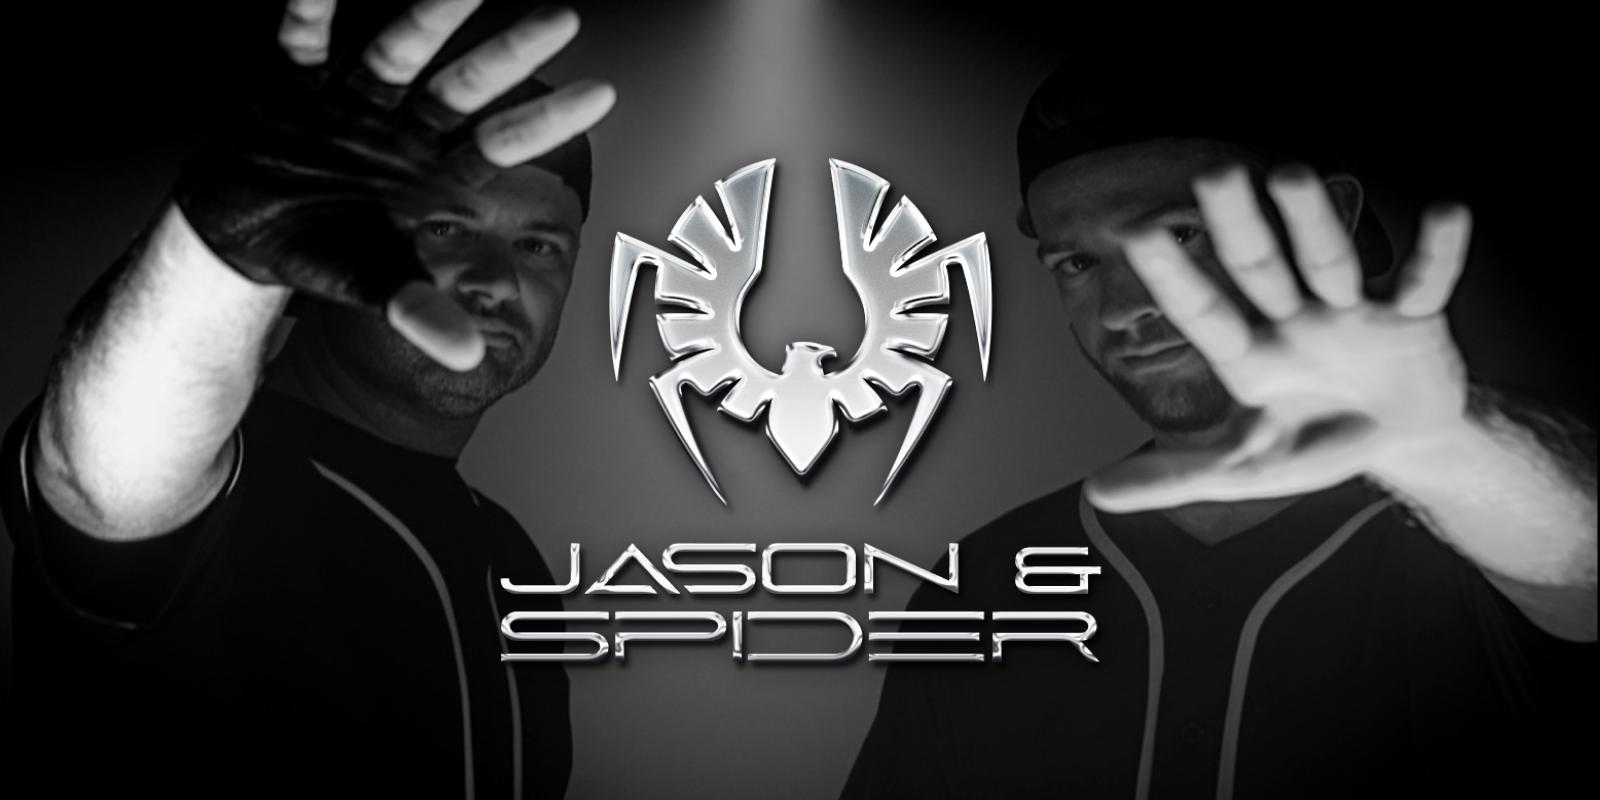 Jason and Spider